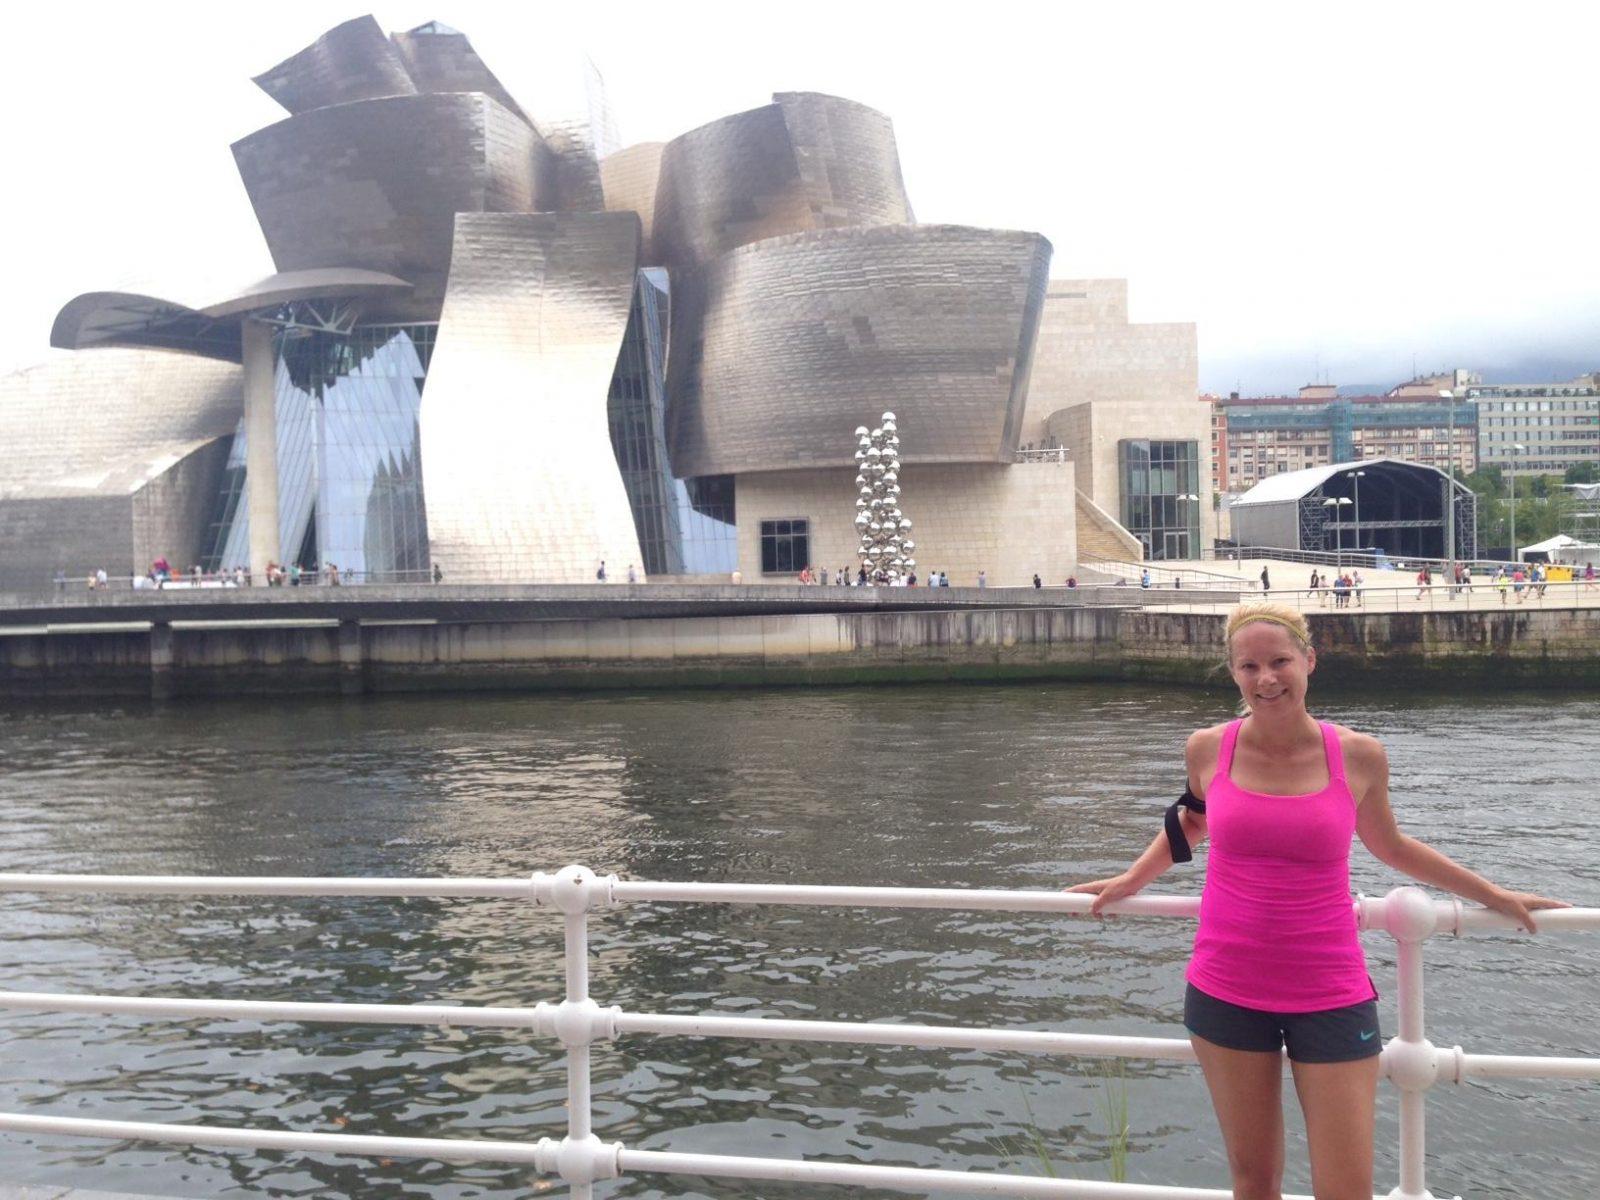 Oh hey there Guggenheim.